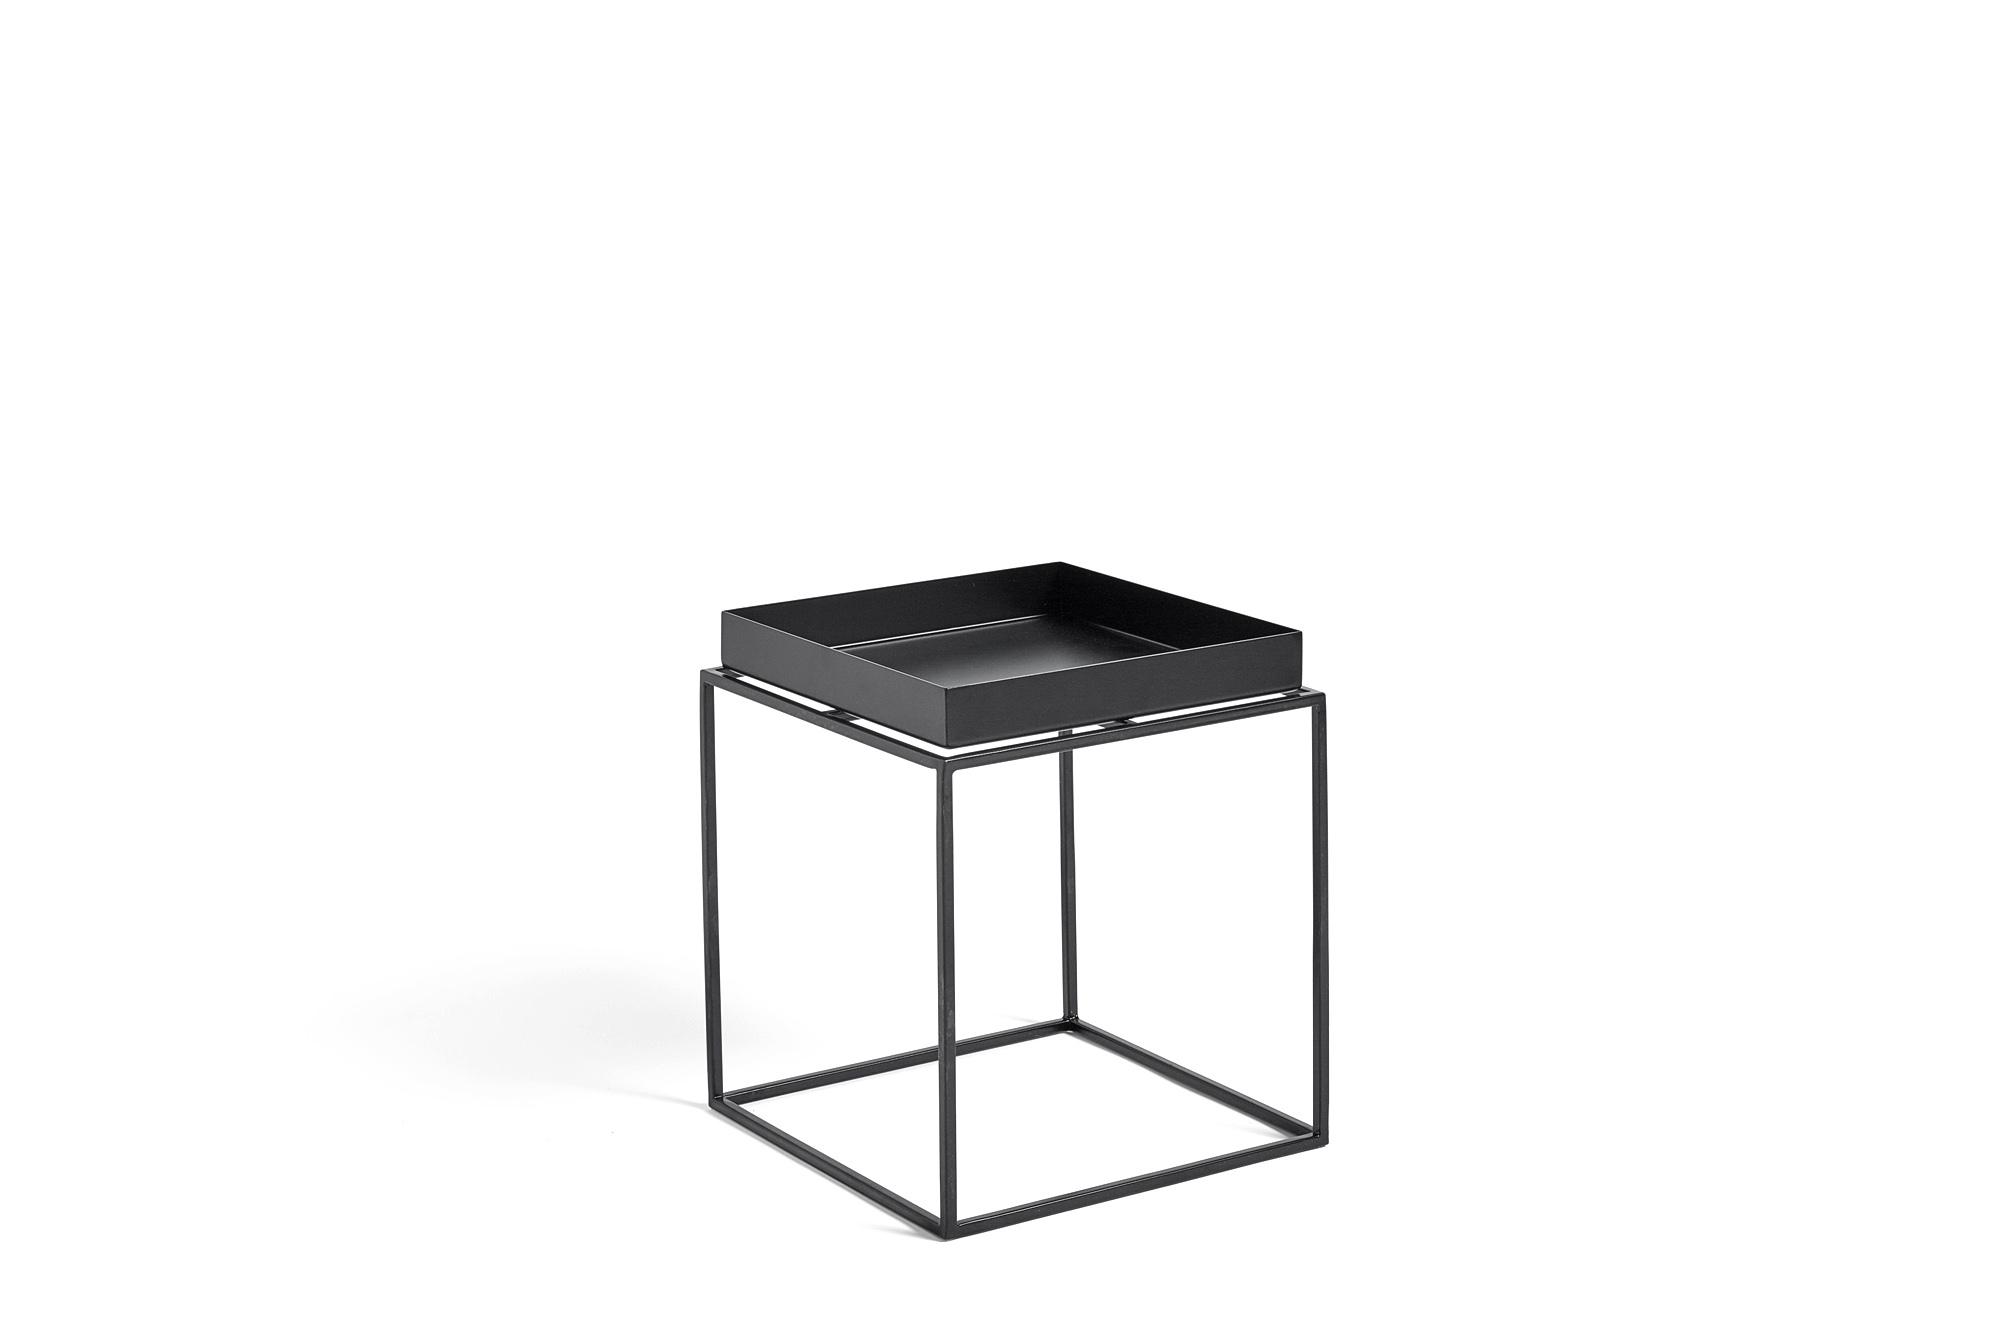 1025011009000_Tray Table_30x30_Black